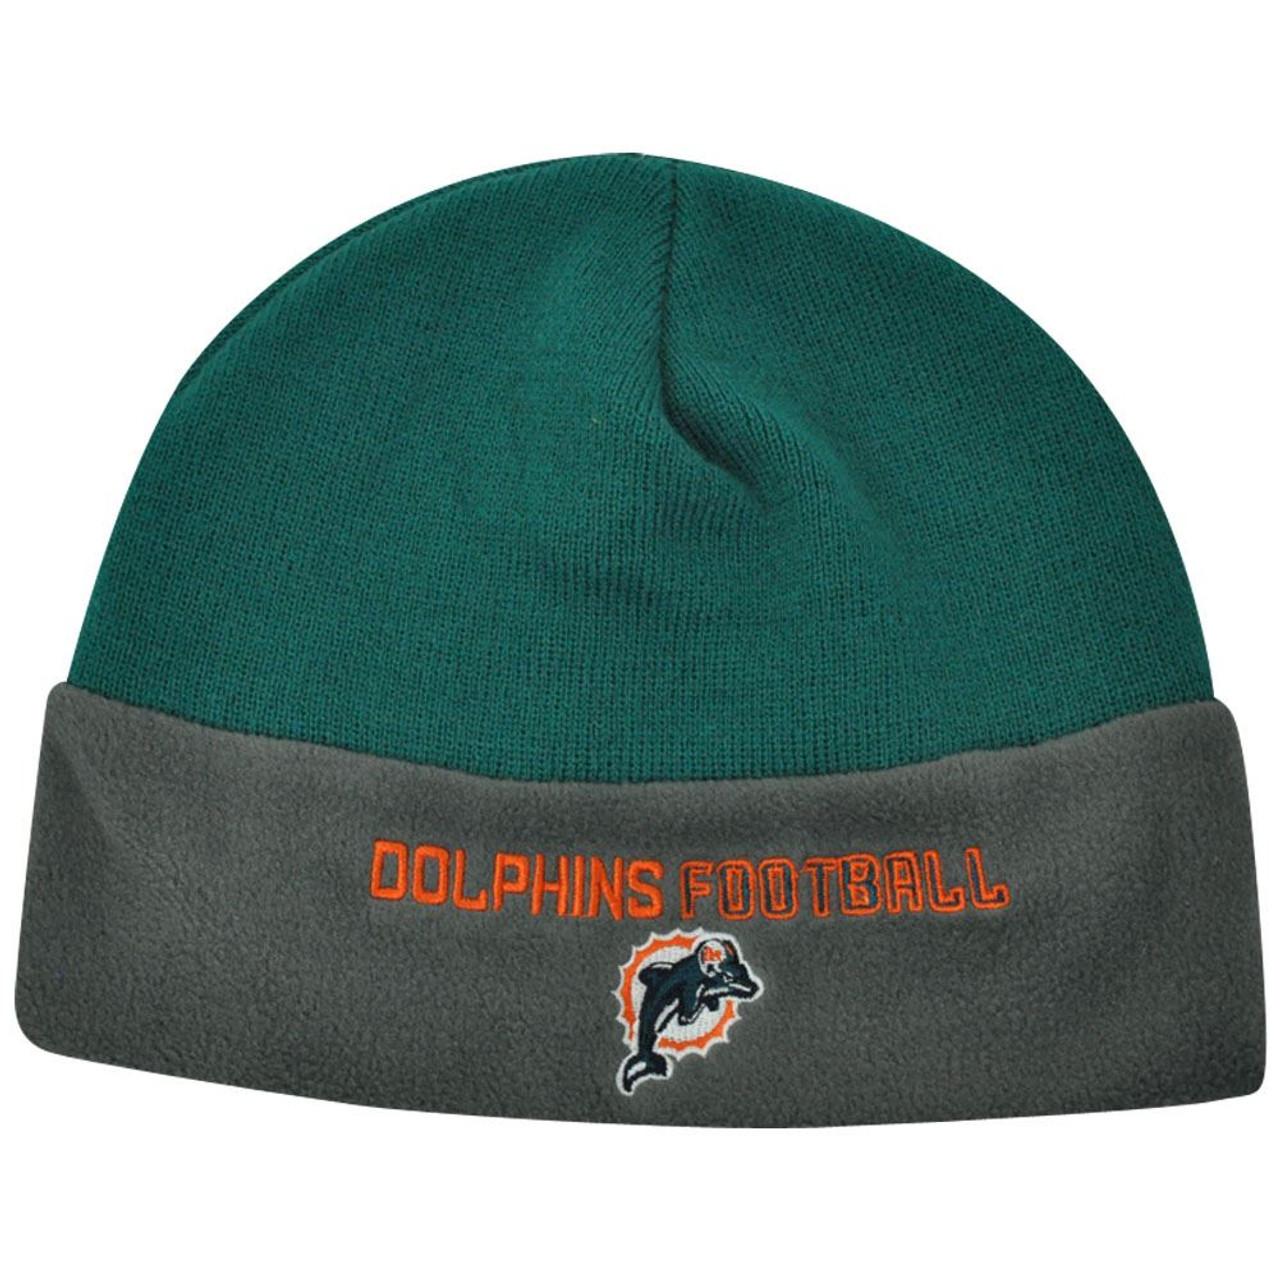 NFL Miami Dolphins Youth Team Spirit Two Tone Fleece Cuffless Beanie Winter  Knit - Sinbad Sports Store bcf673755